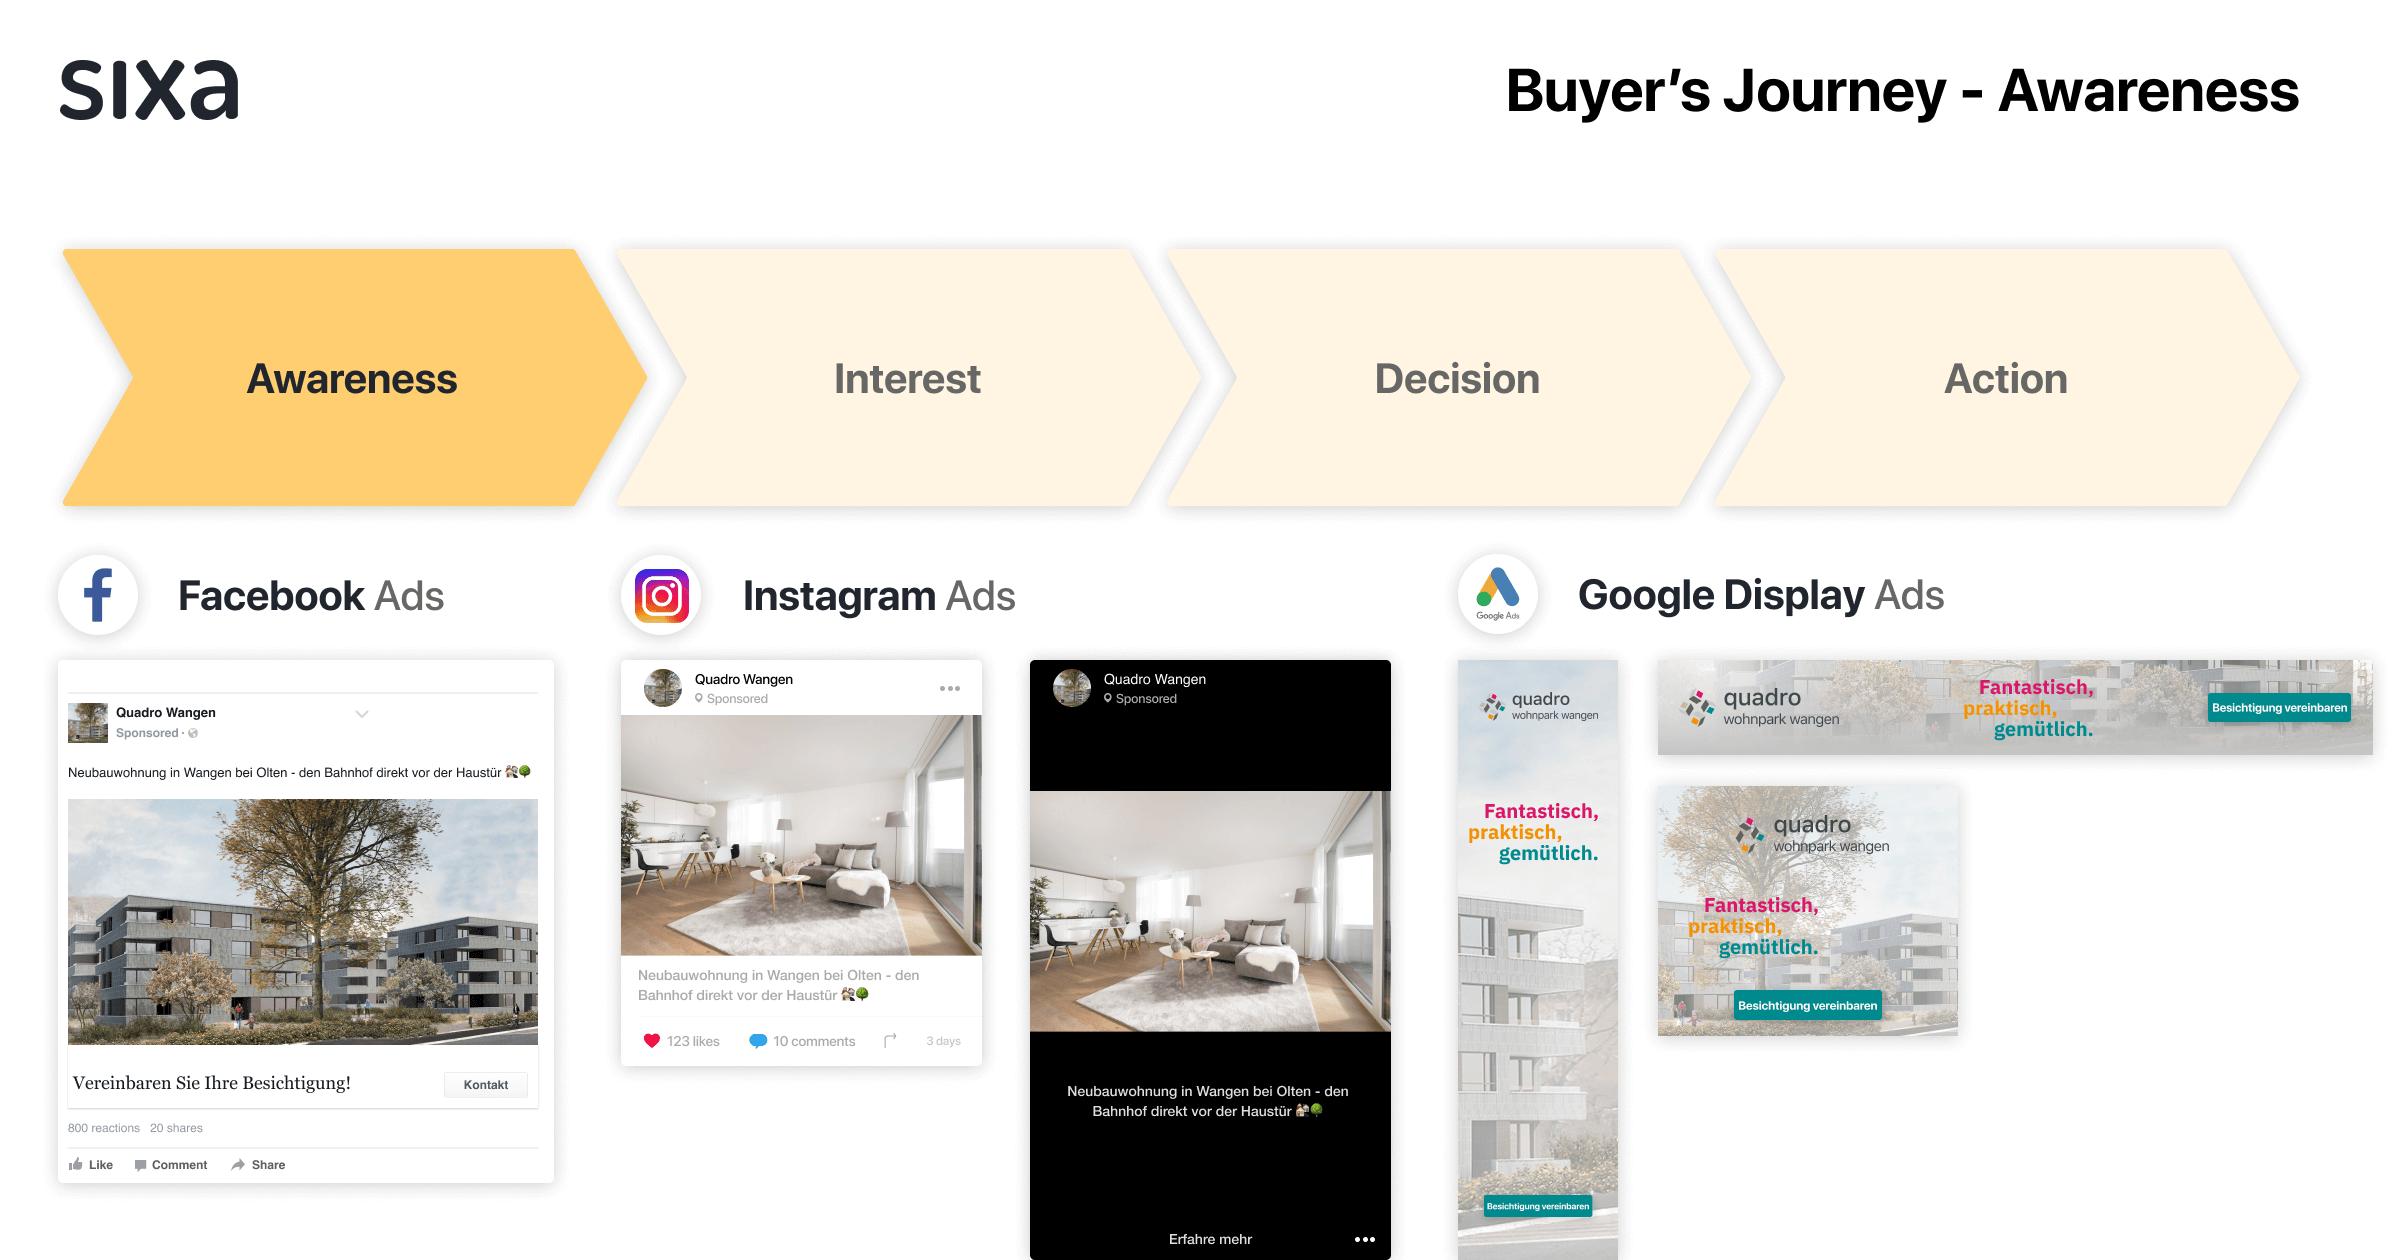 Übersicht Buyer's Journey - Awereness.